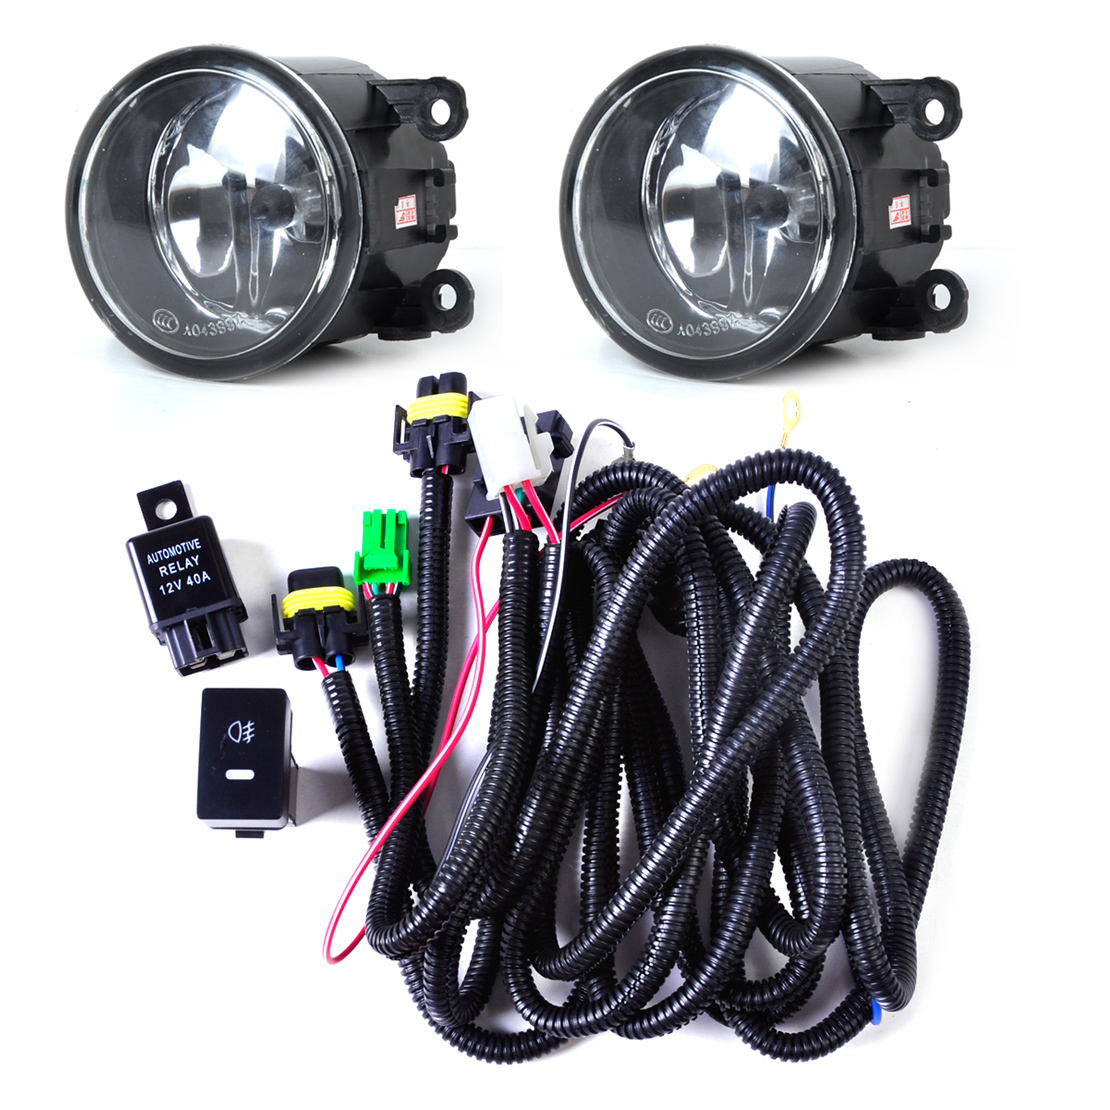 hight resolution of dwcx black wiring harness sockets switch 2 fog lights h11 lamp 12v 55w kit